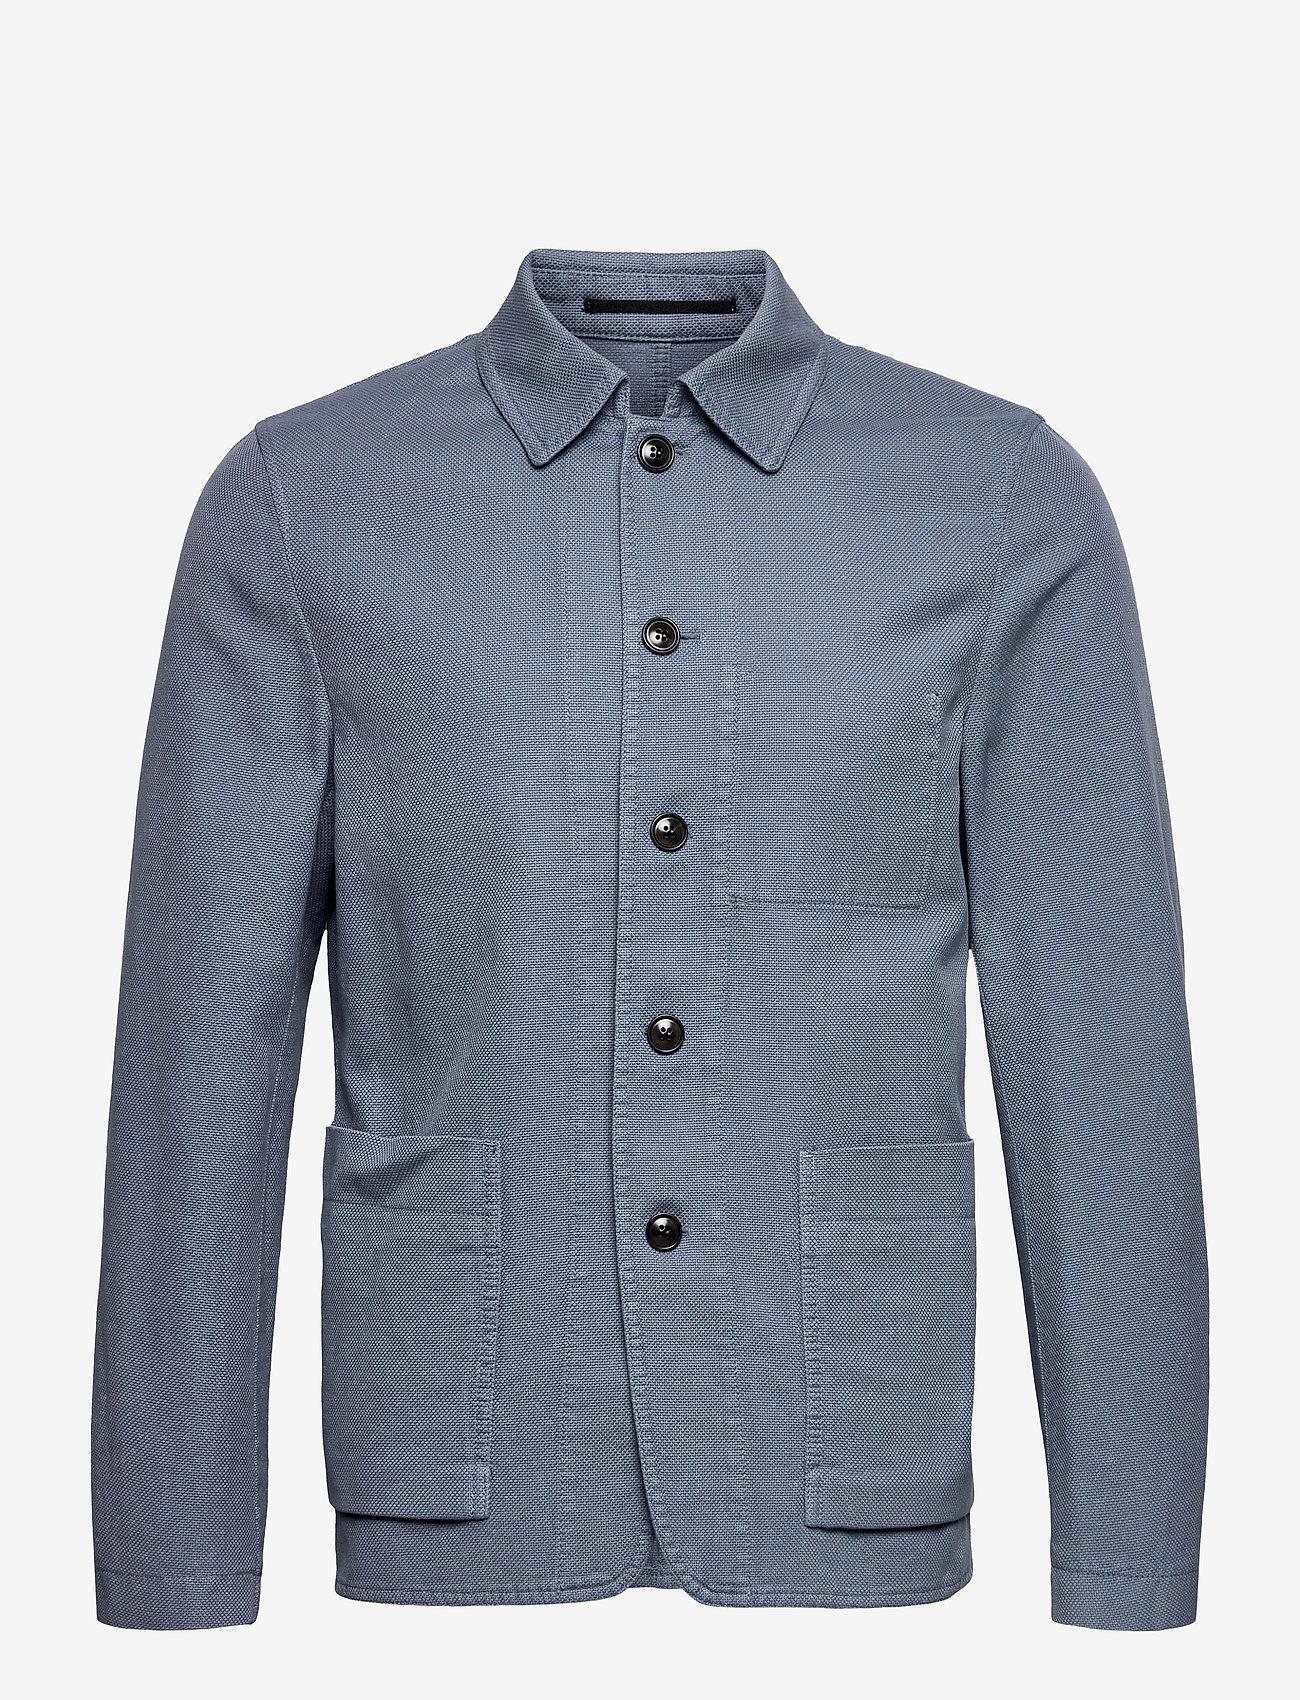 Tiger of Sweden - GIONNIE GD - basic skjorter - air force blue - 0